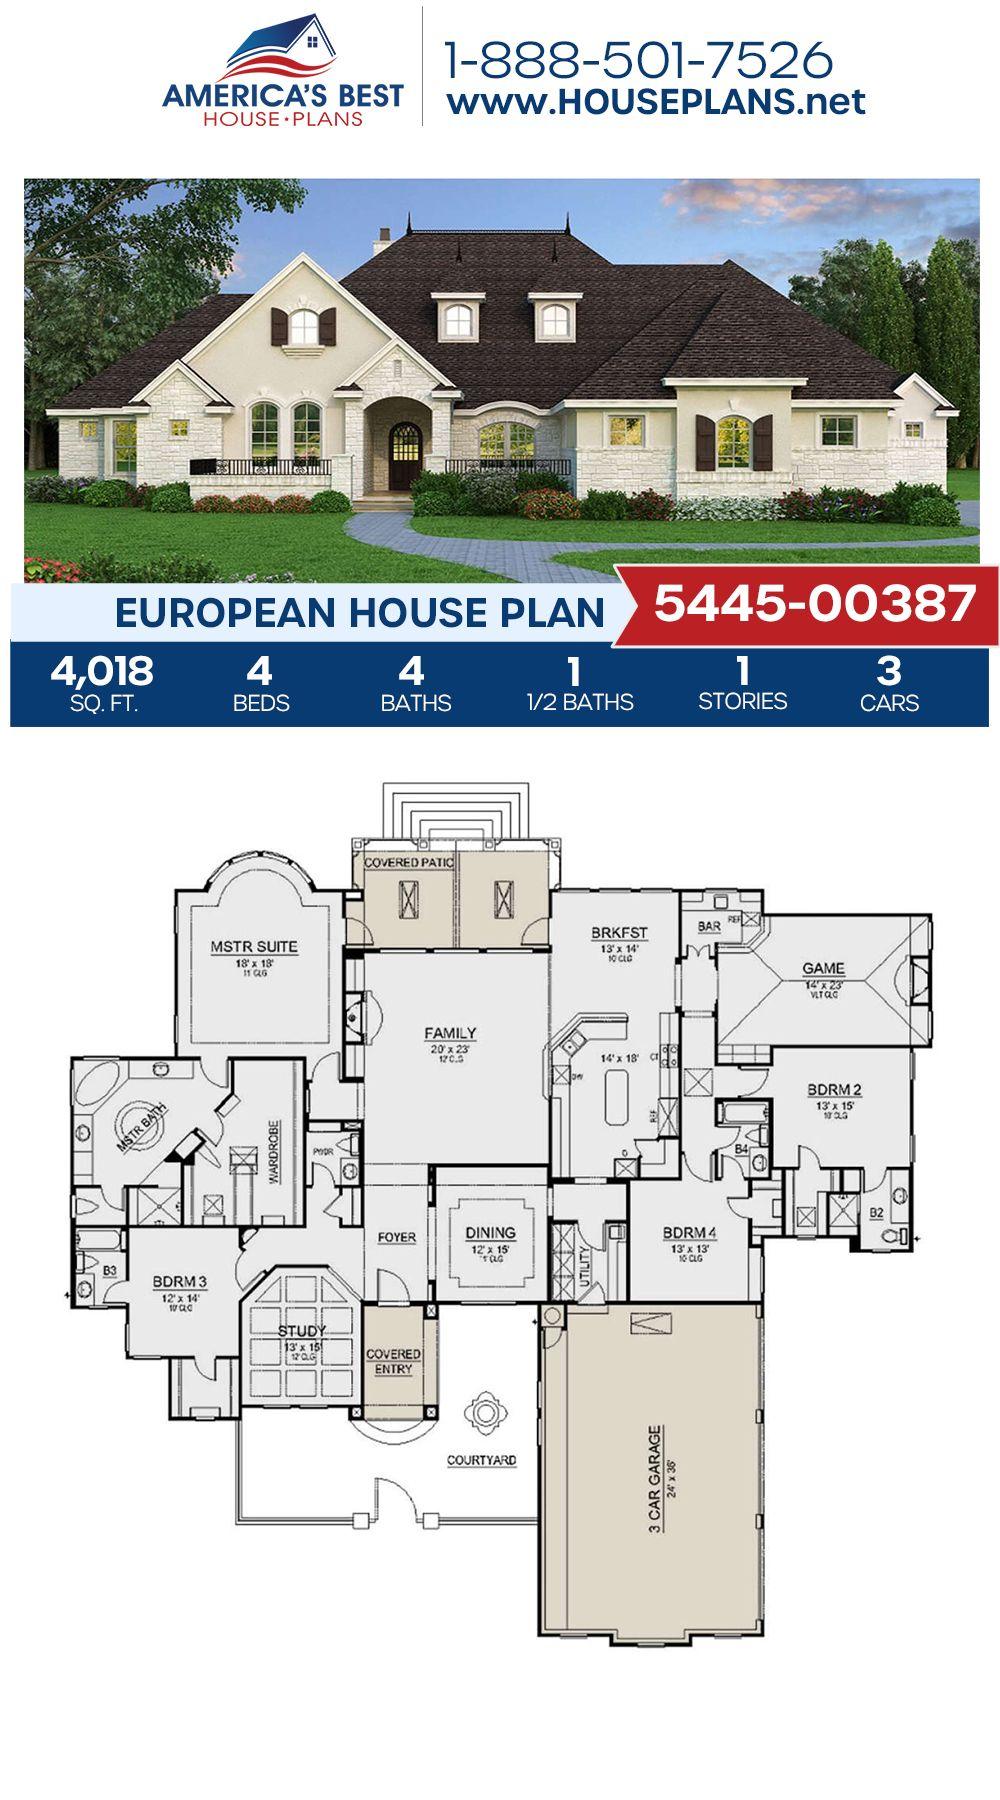 House Plan 5445 00387 European Plan 4 018 Square Feet 4 Bedrooms 4 5 Bathrooms Craftsman House Plans Open House Plans Dream House Plans